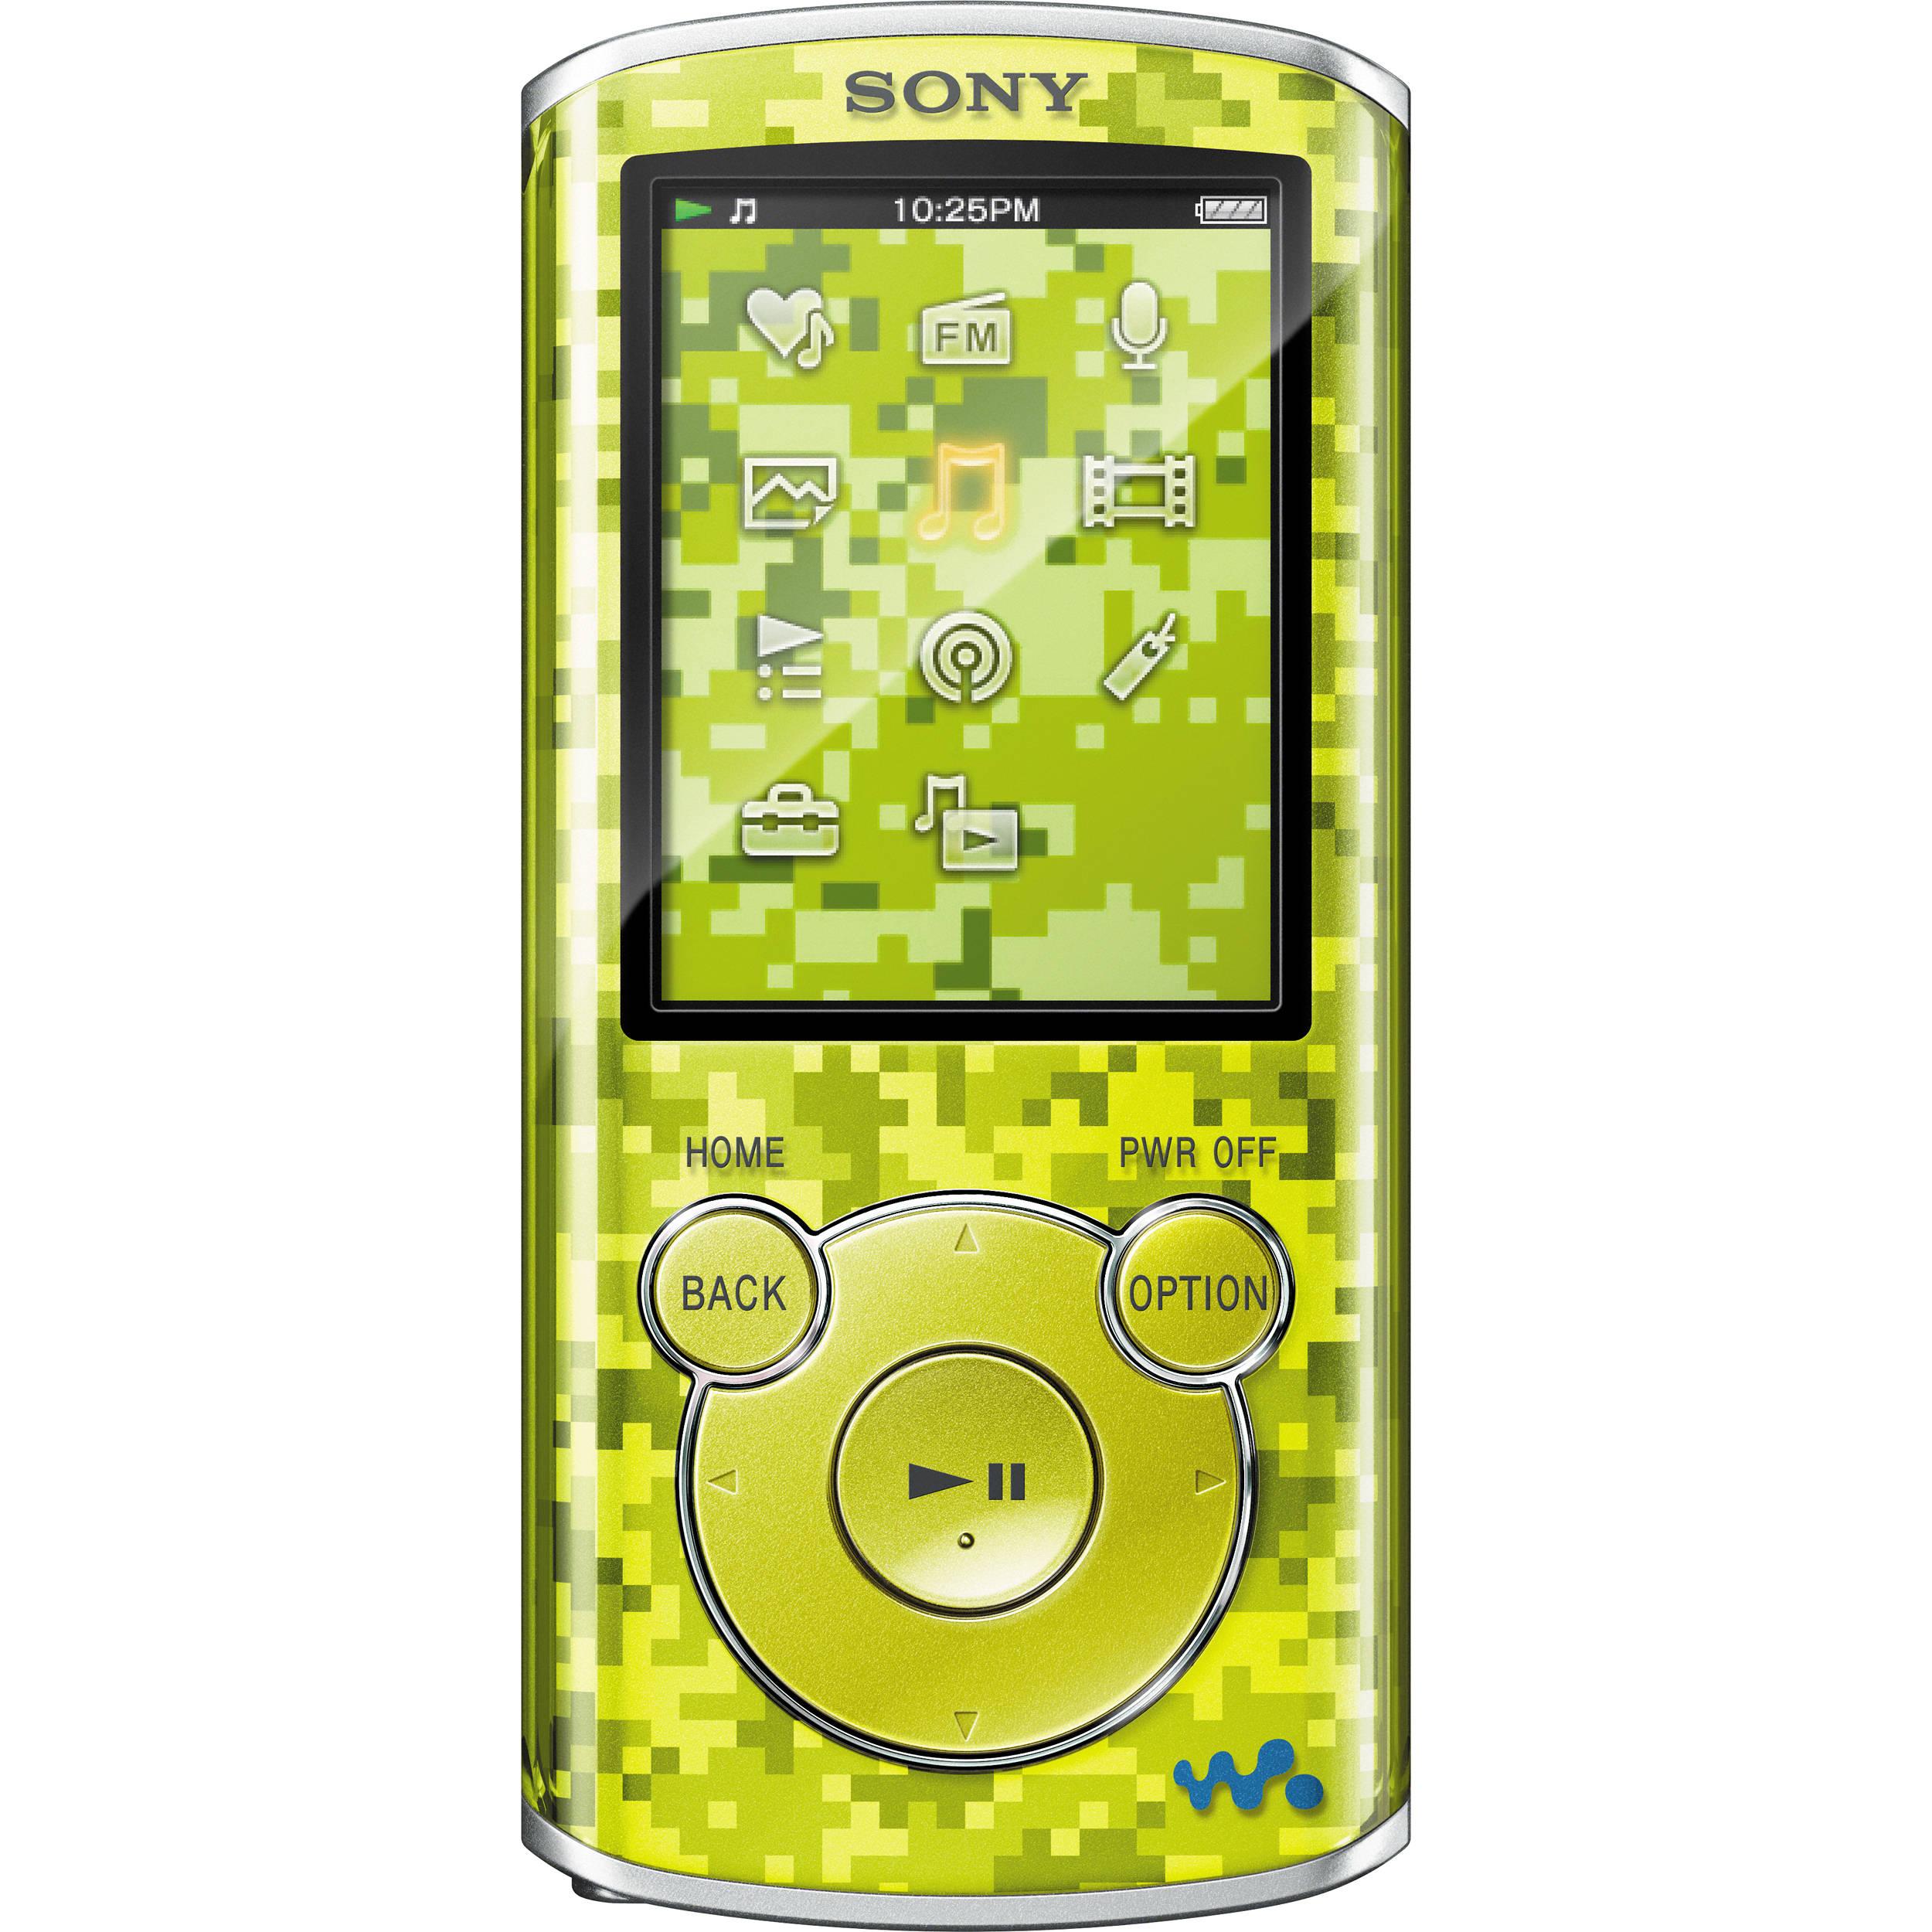 sony walkman mp3 8gb player manual